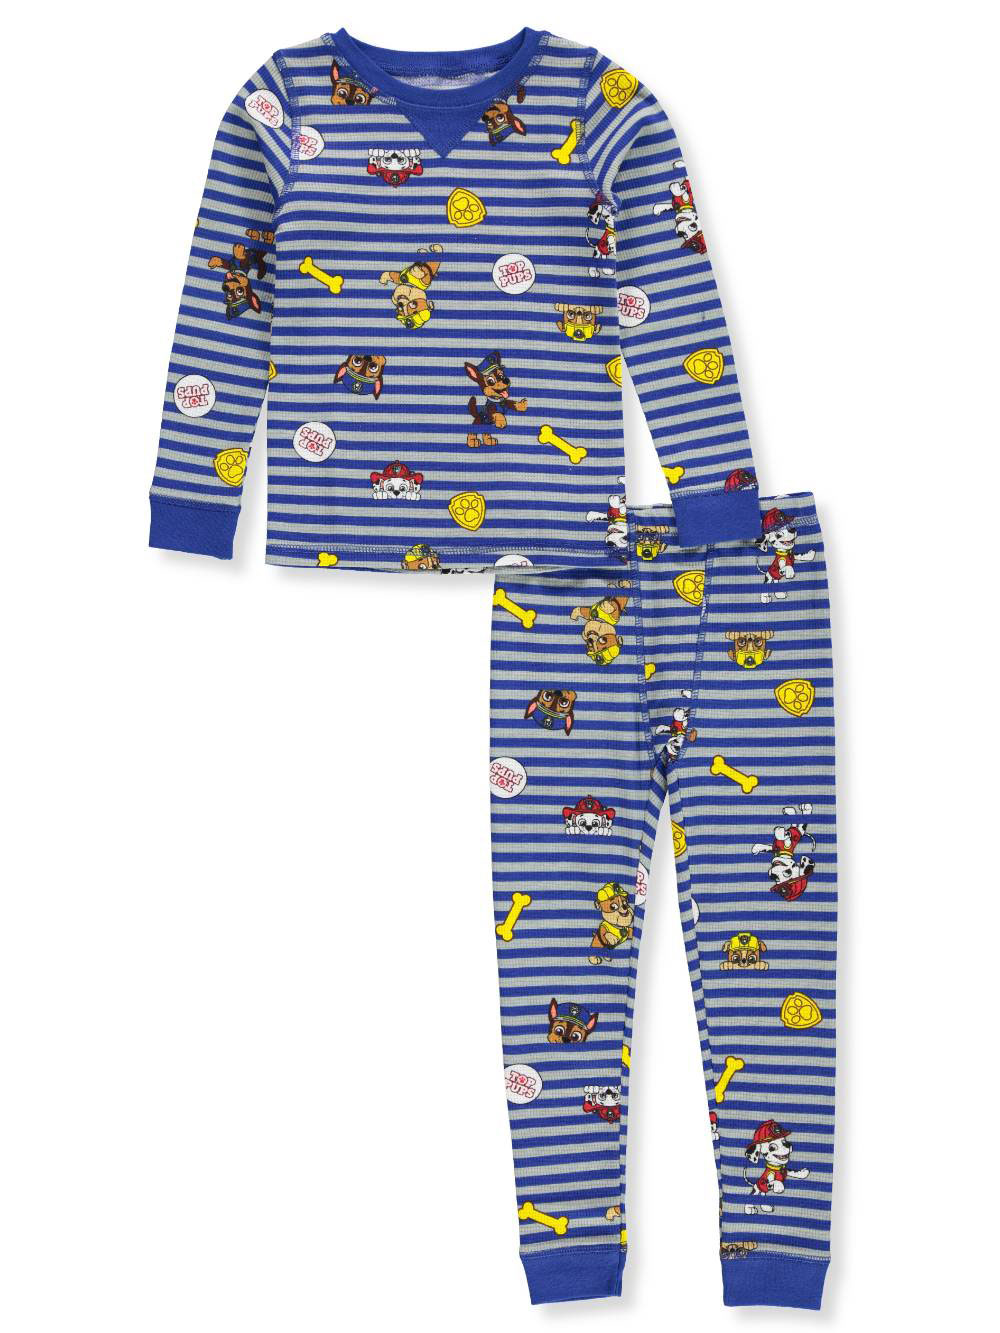 Paw Patrol Boys' 2-Piece Thermal Long Underwear Set